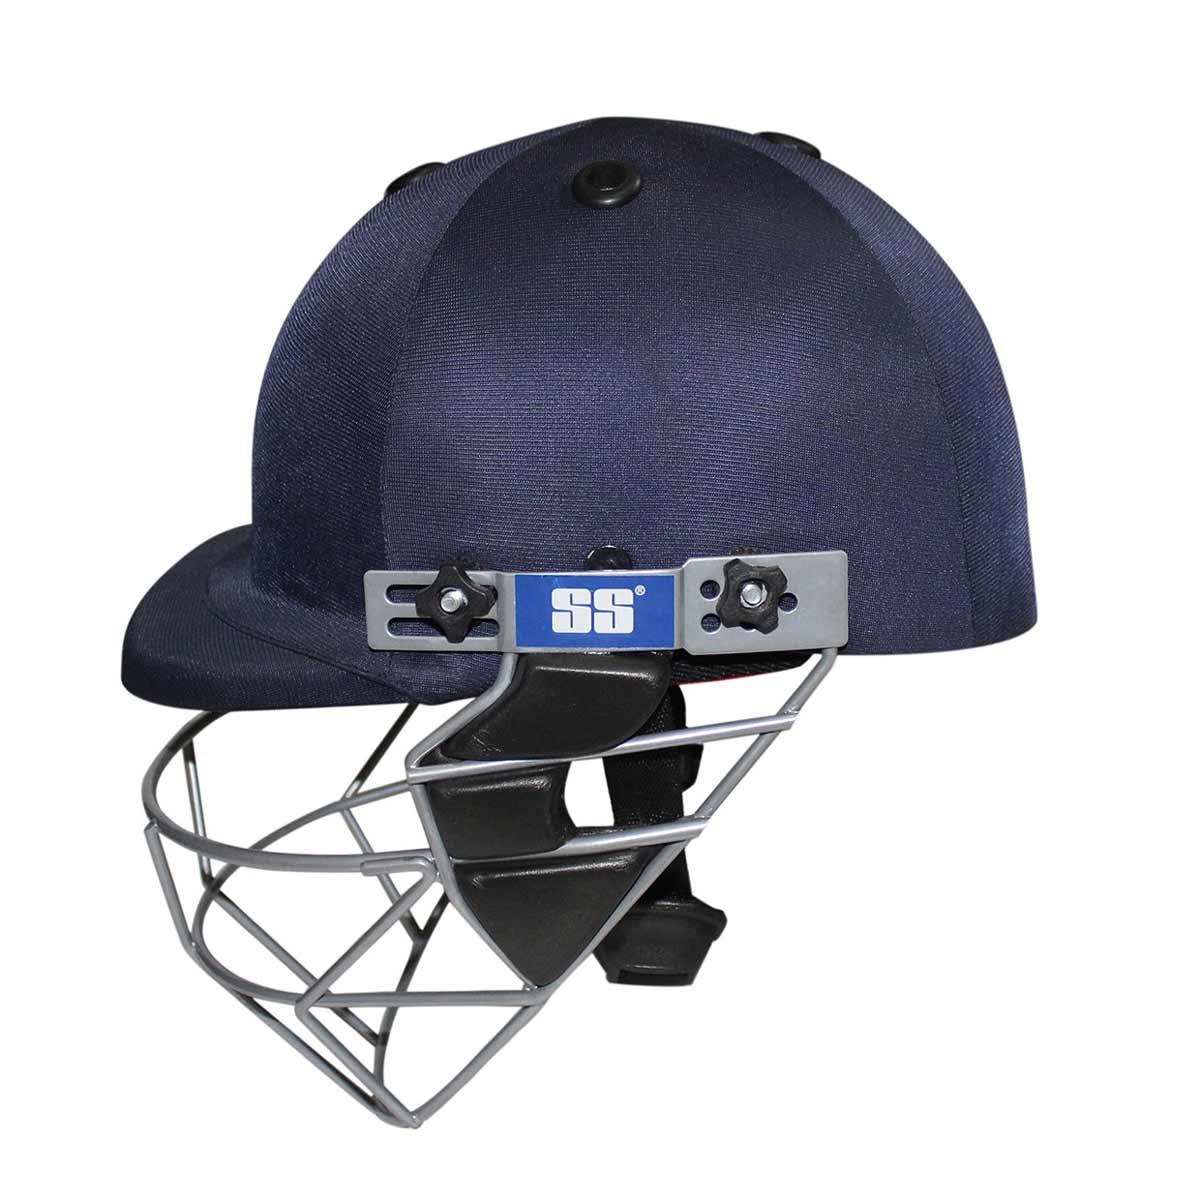 5355f8ce3b3 Buy SS Master Cricket Helmet Online in India